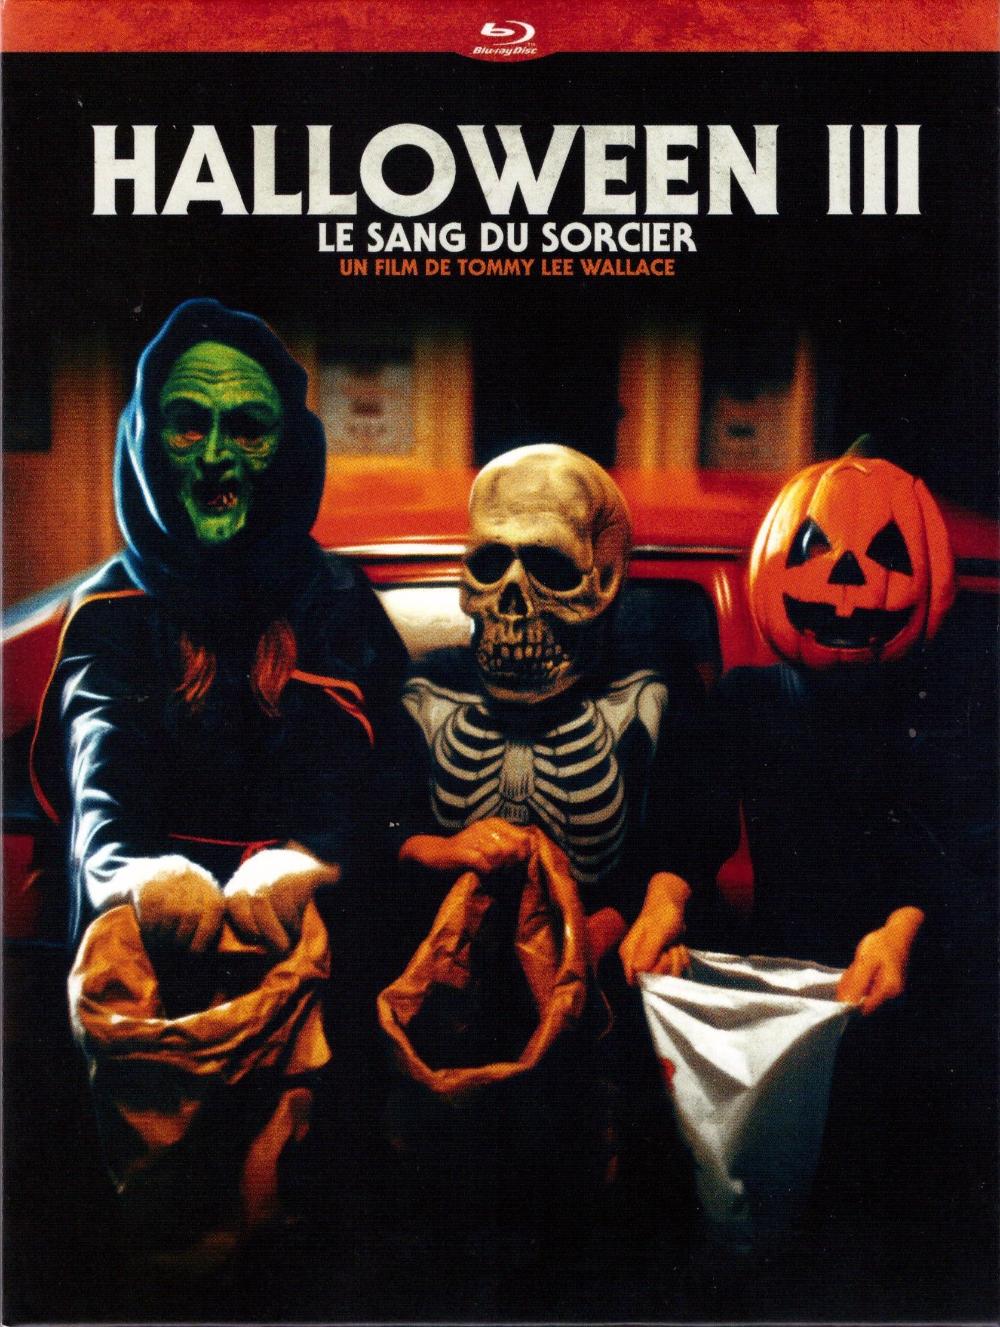 Halloween 2020 Bluray Release Date Halloween III: Season of the Witch Blu ray Release Date January 1